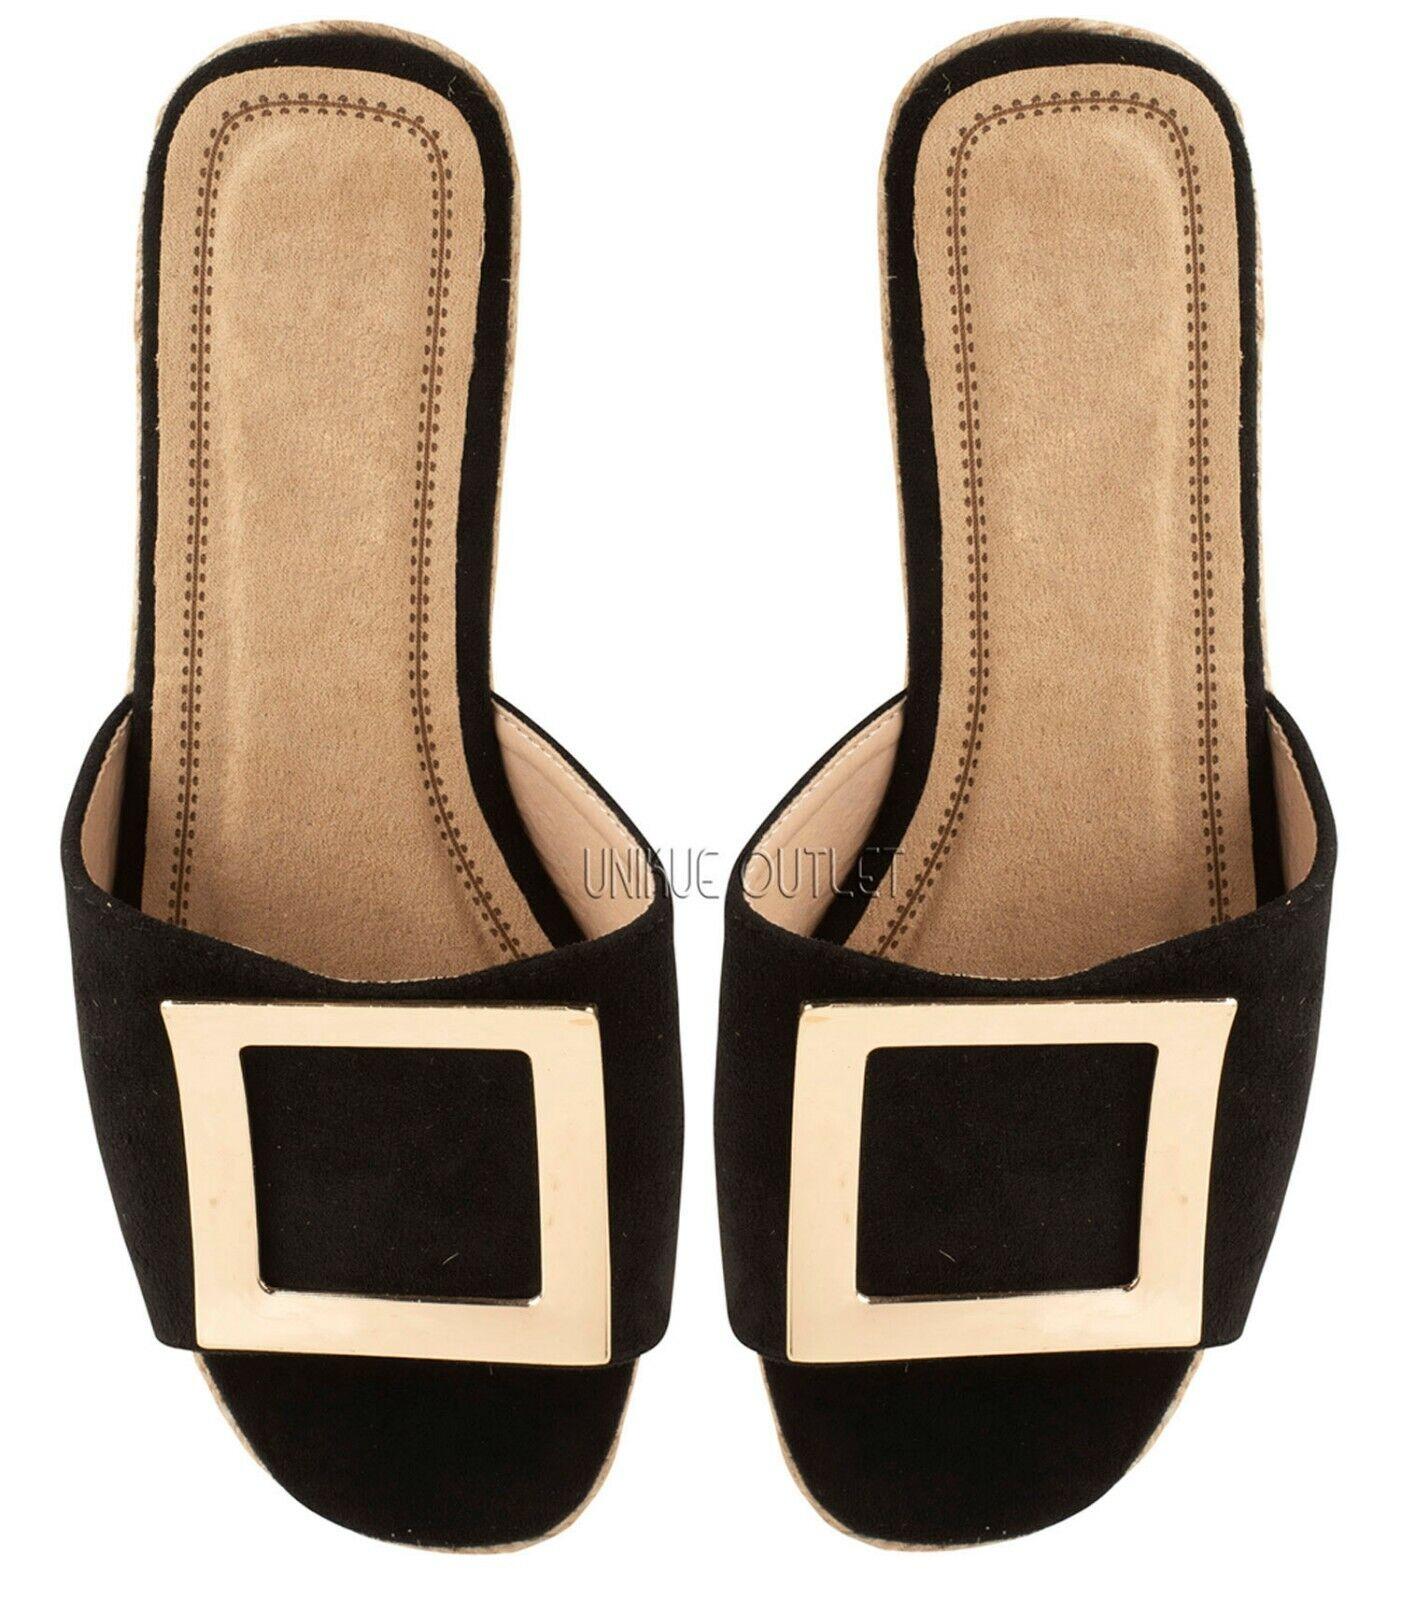 Details about  /Womens Ladies Platform Sliders Flatform Slip On Summer Sandals Mules Shoe Size